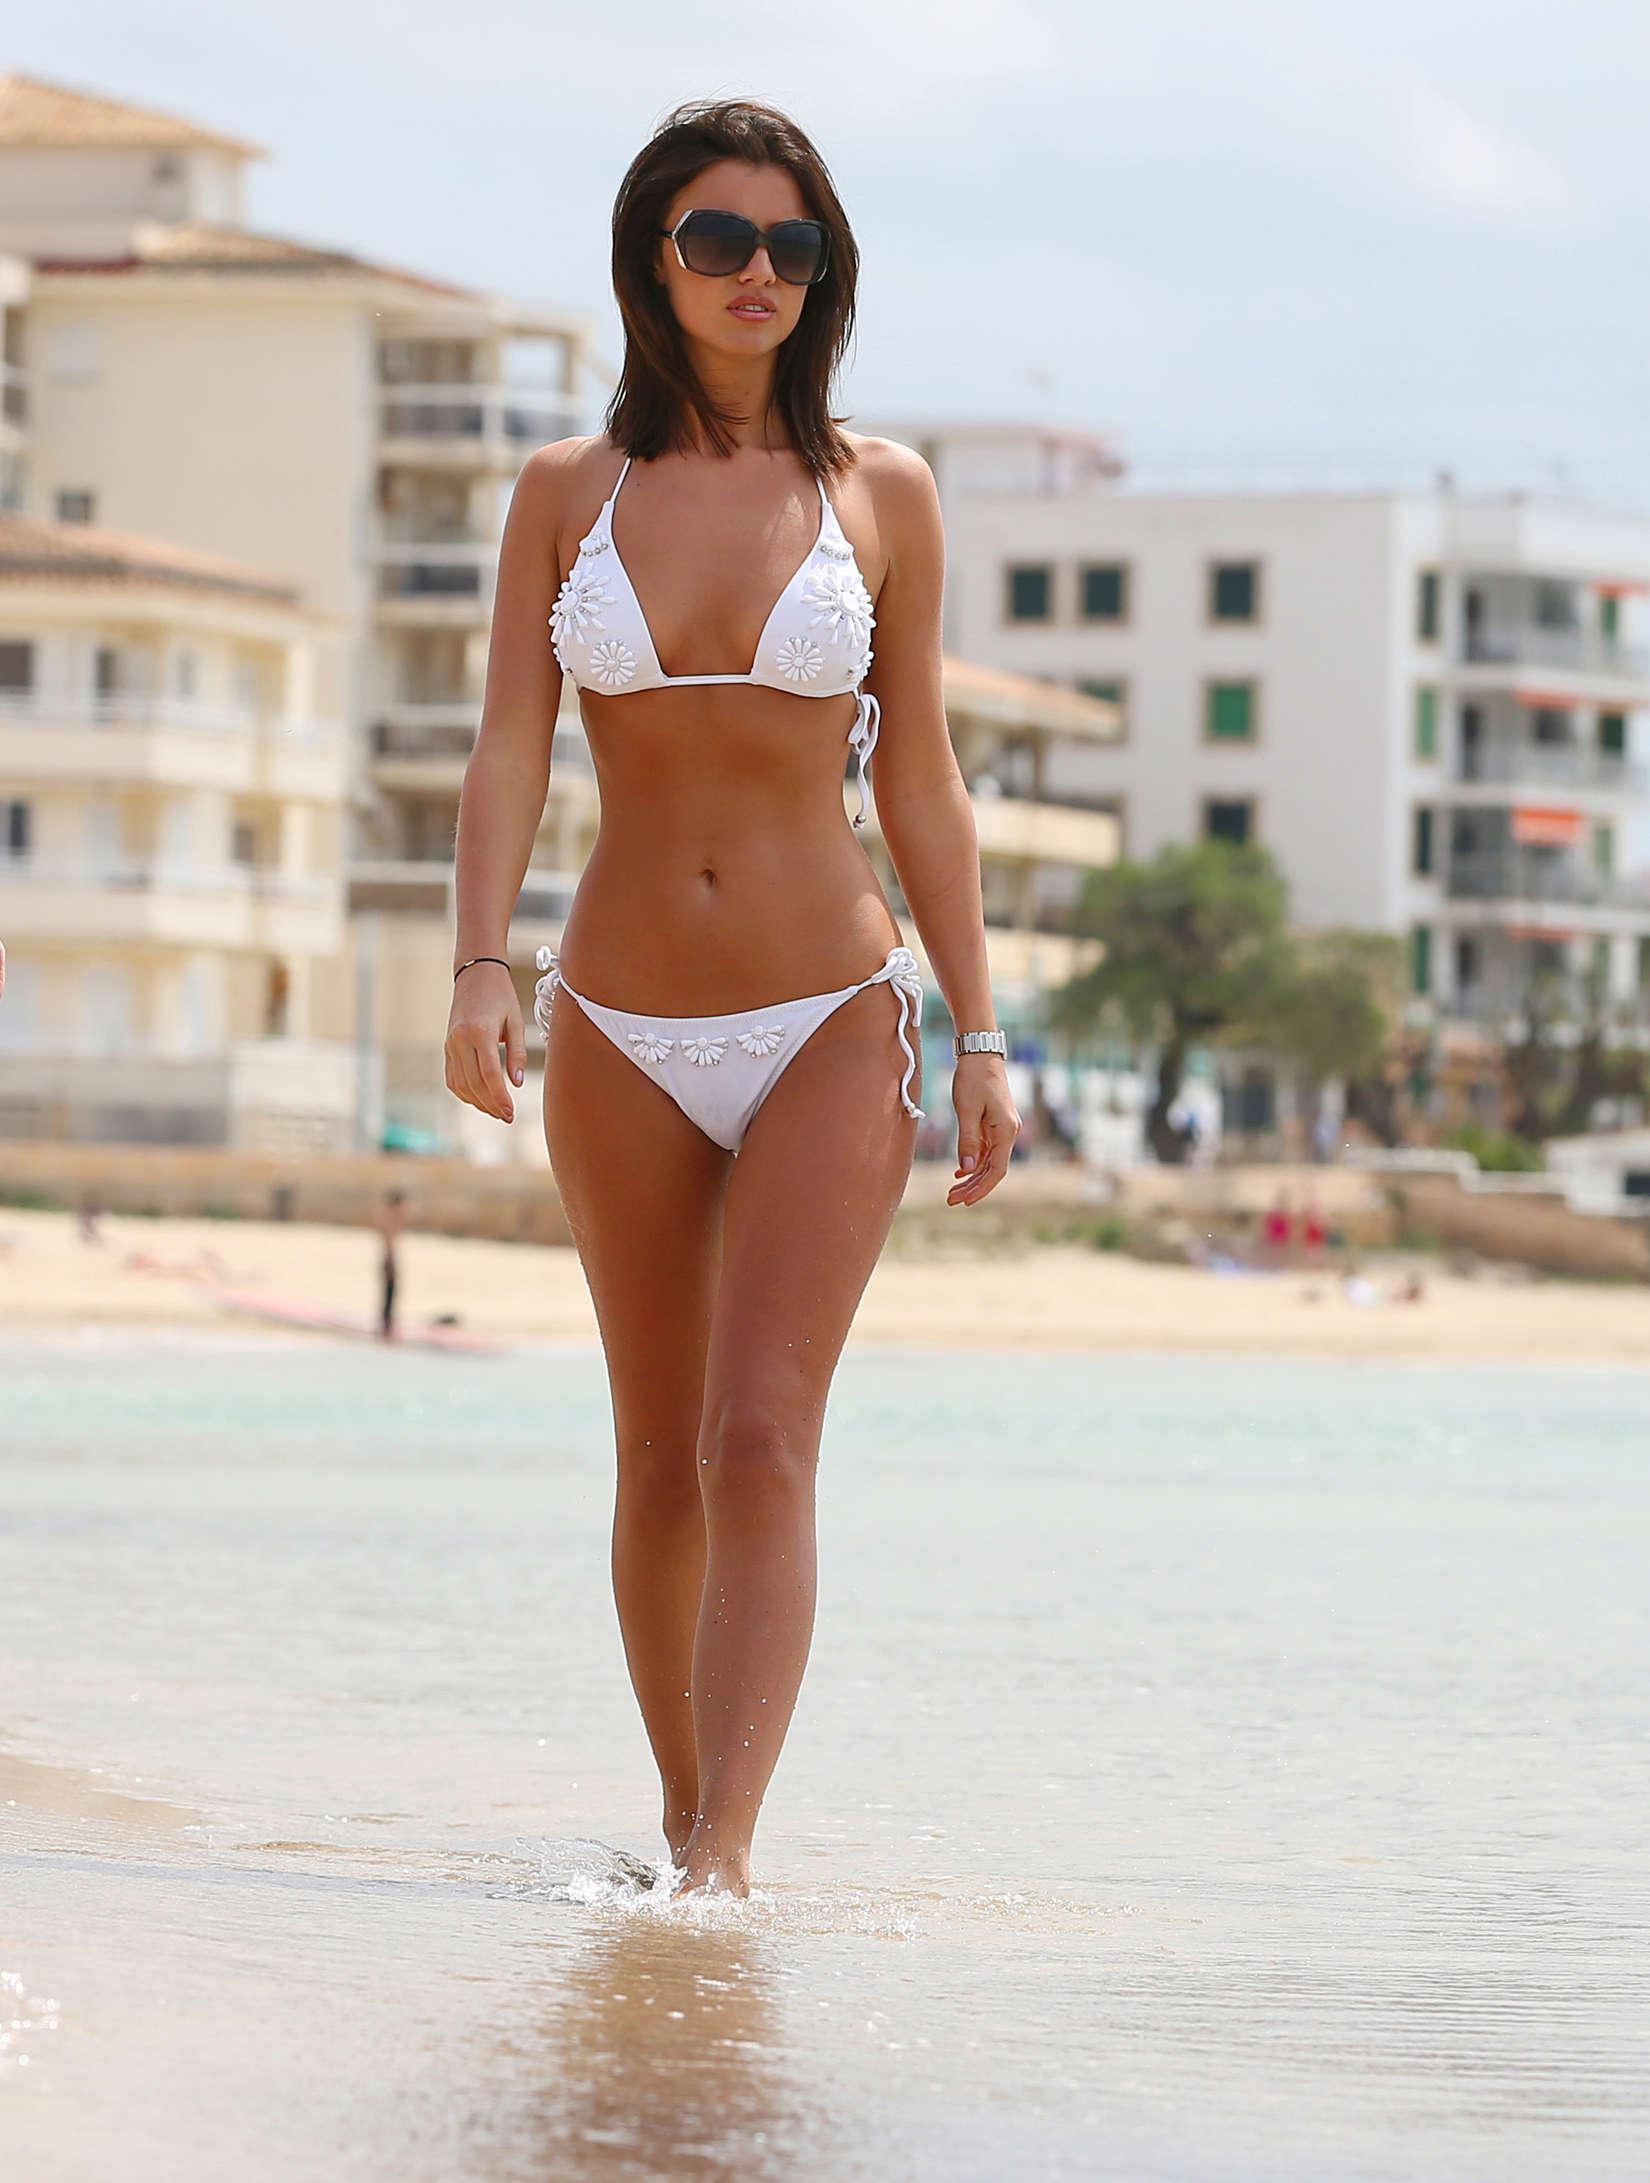 Lucy Mecklenburgh 2013 : Lucy Mecklenburgh White bikini candids in Mallorca – Spain -01